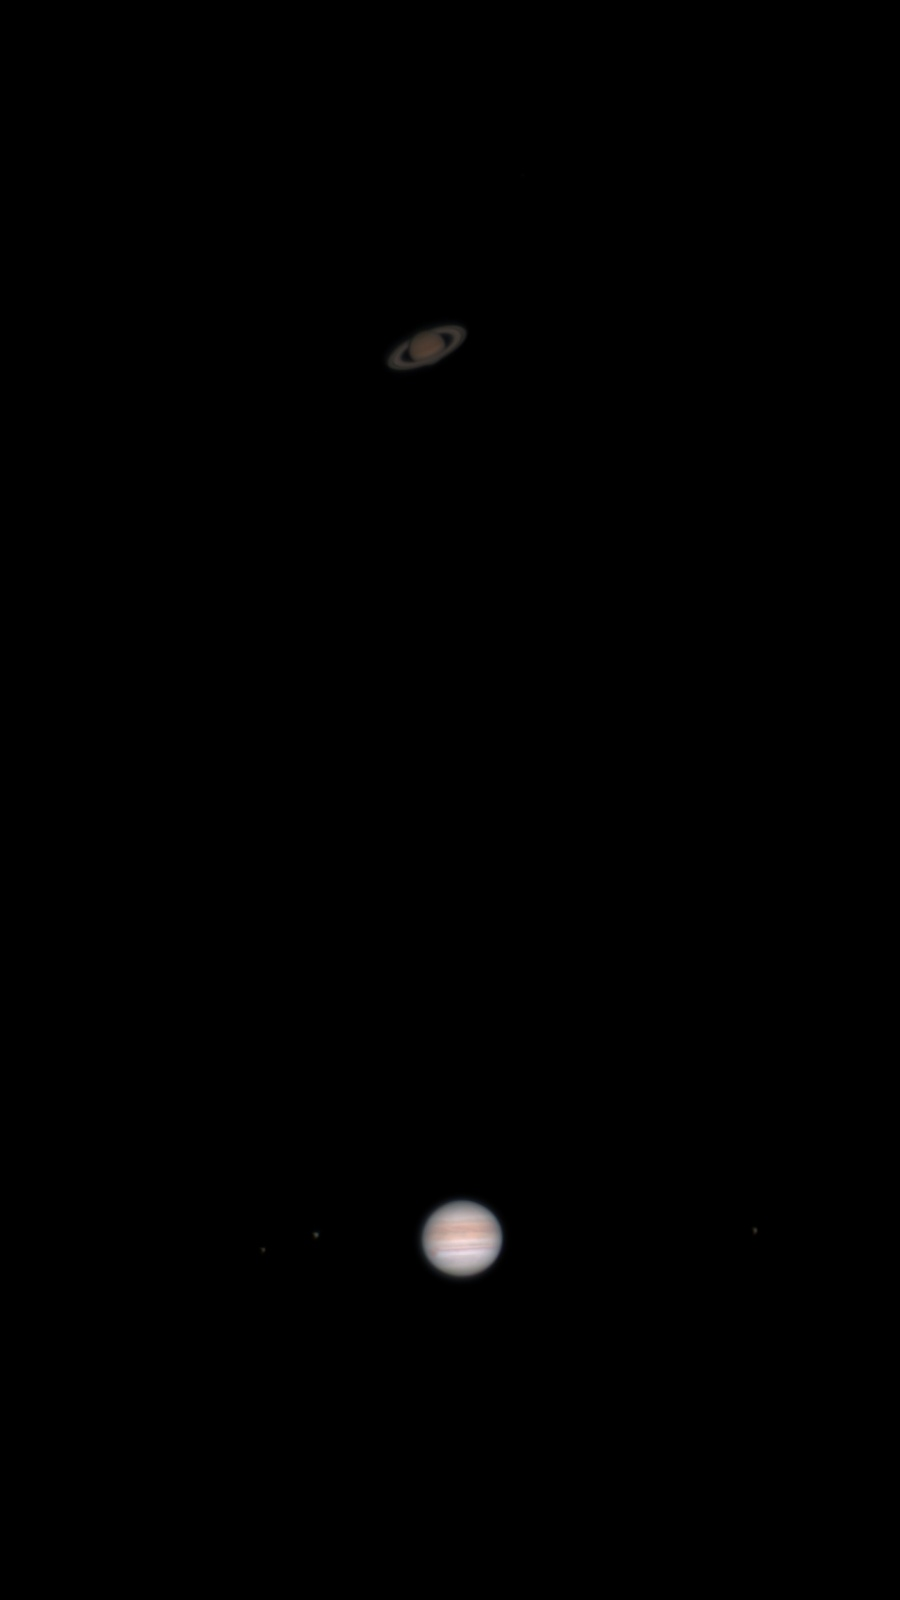 201221-jupiter-saturn-v2.thumb.jpg.0fa79b8491577e92bdd235fc7e927512.jpg